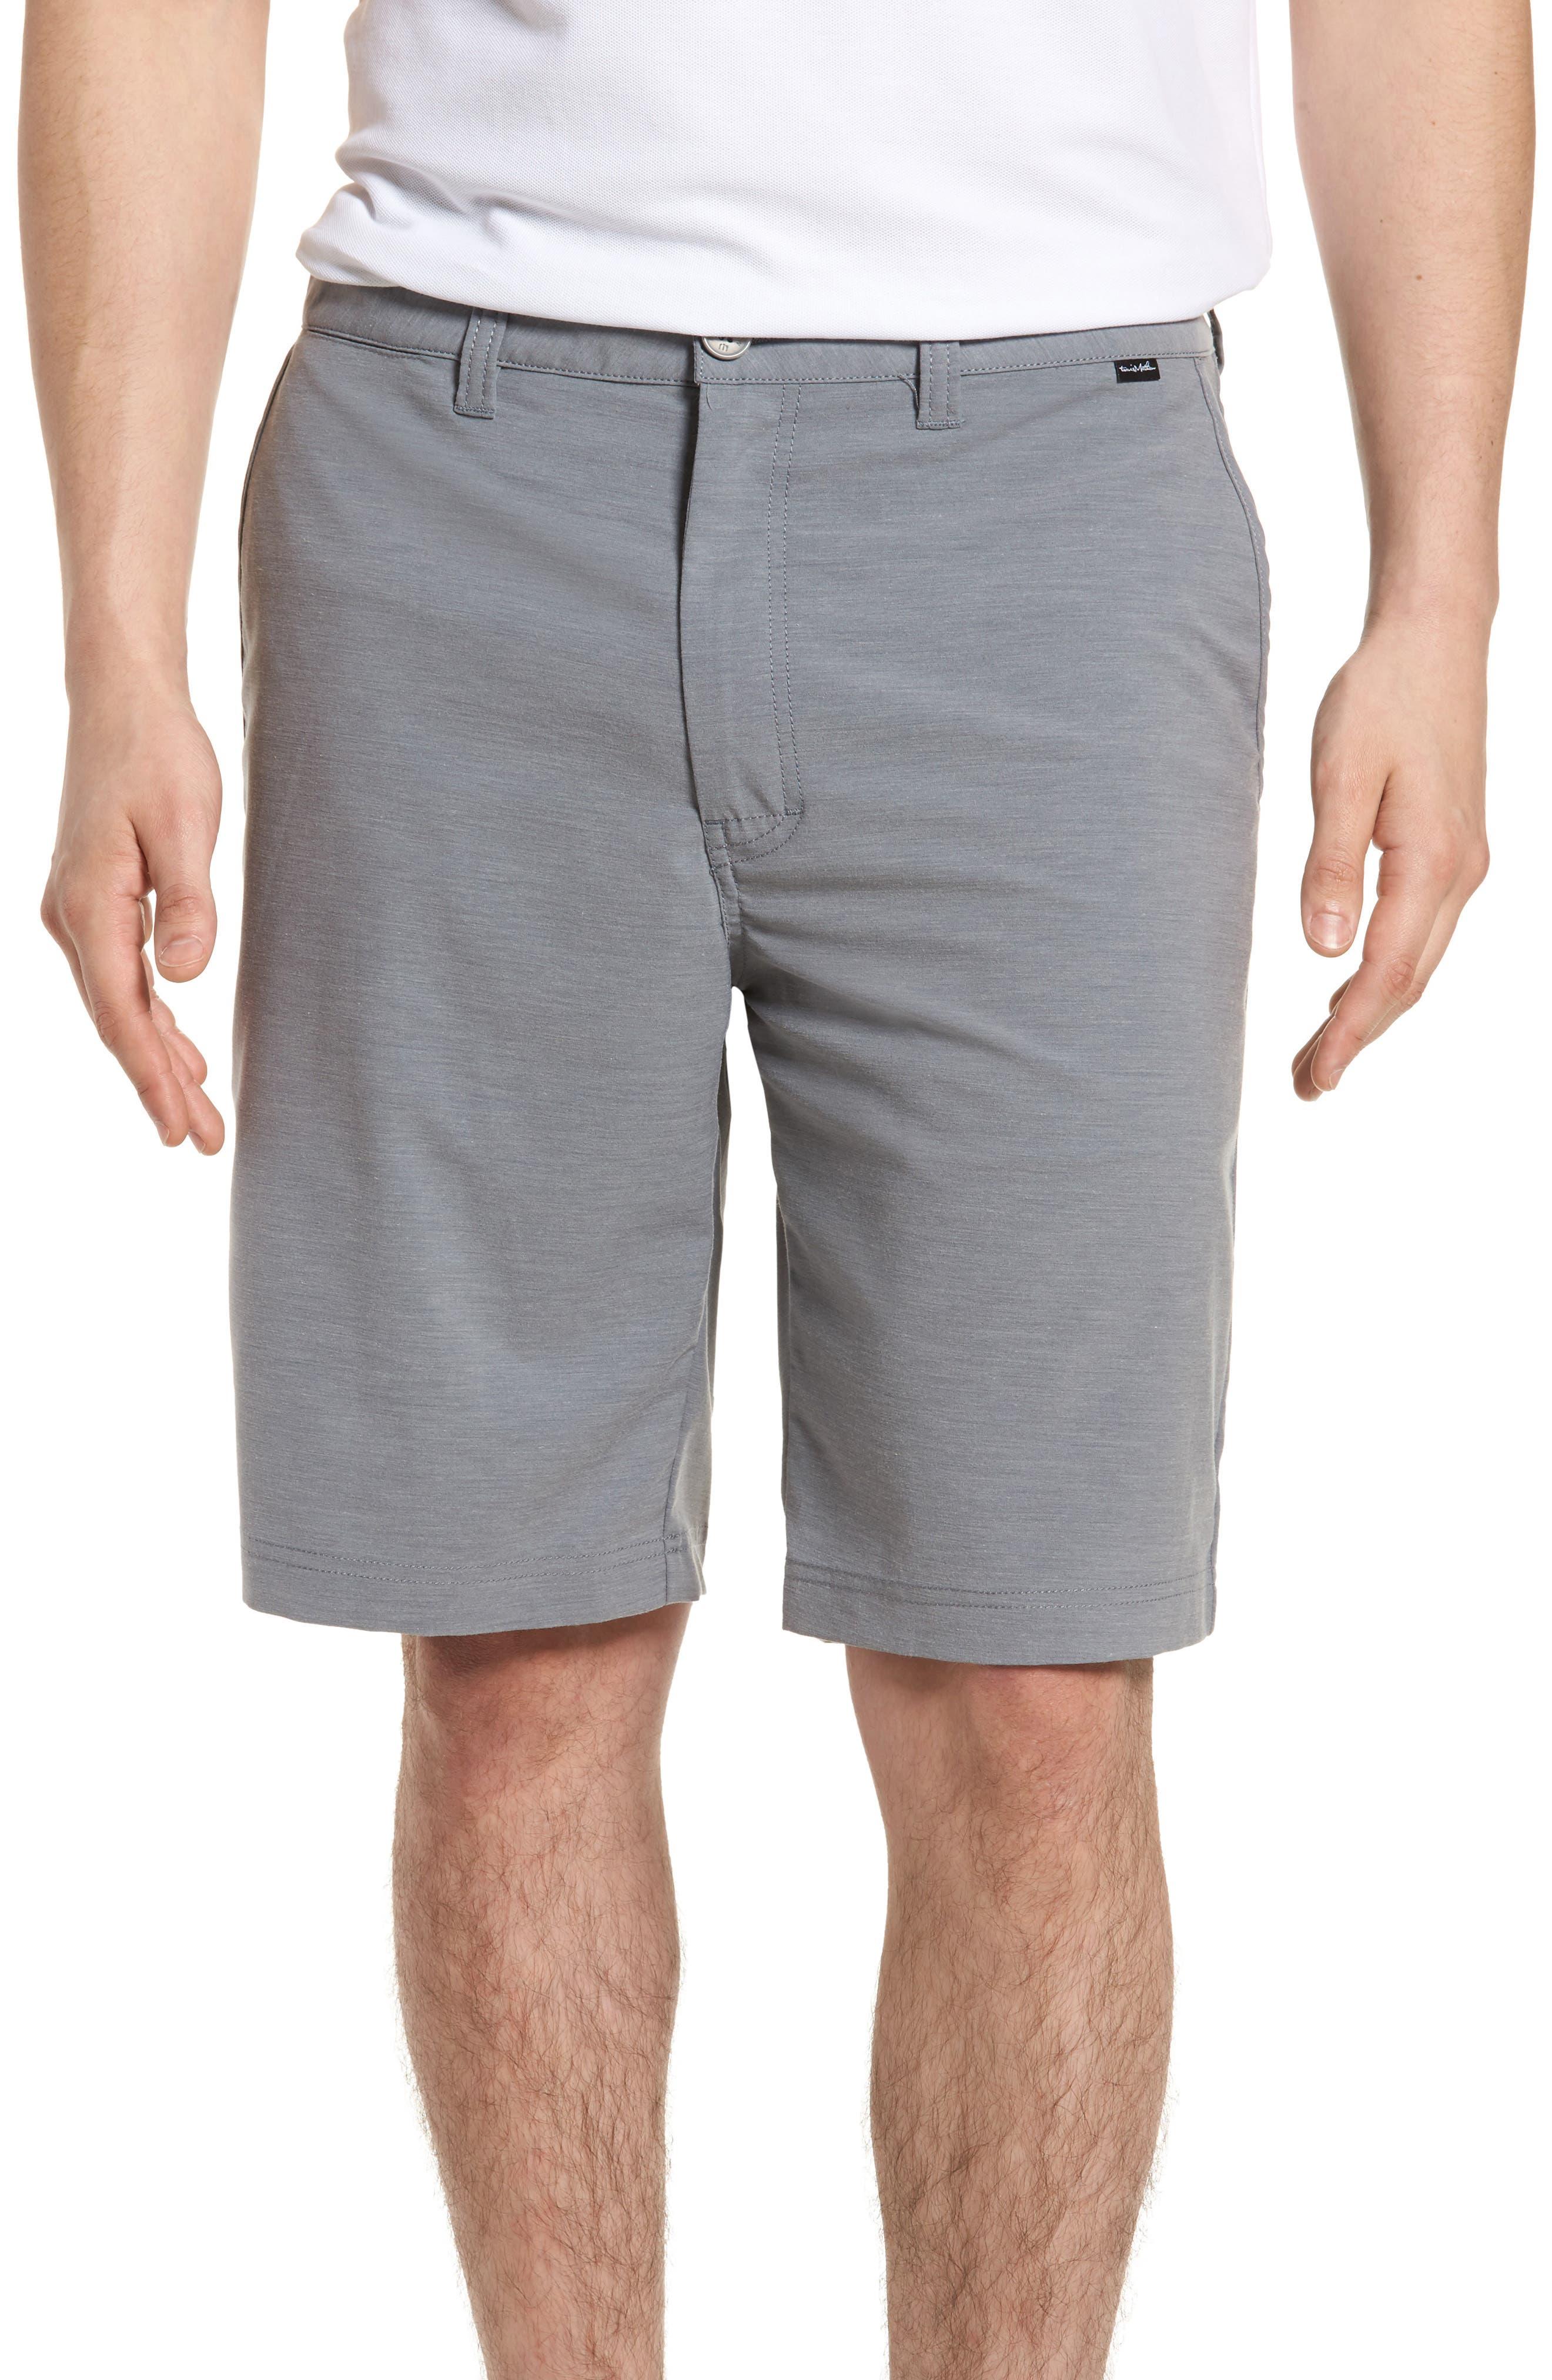 La Paz Regular Fit Slub Knit Shorts,                         Main,                         color, Sharkskin